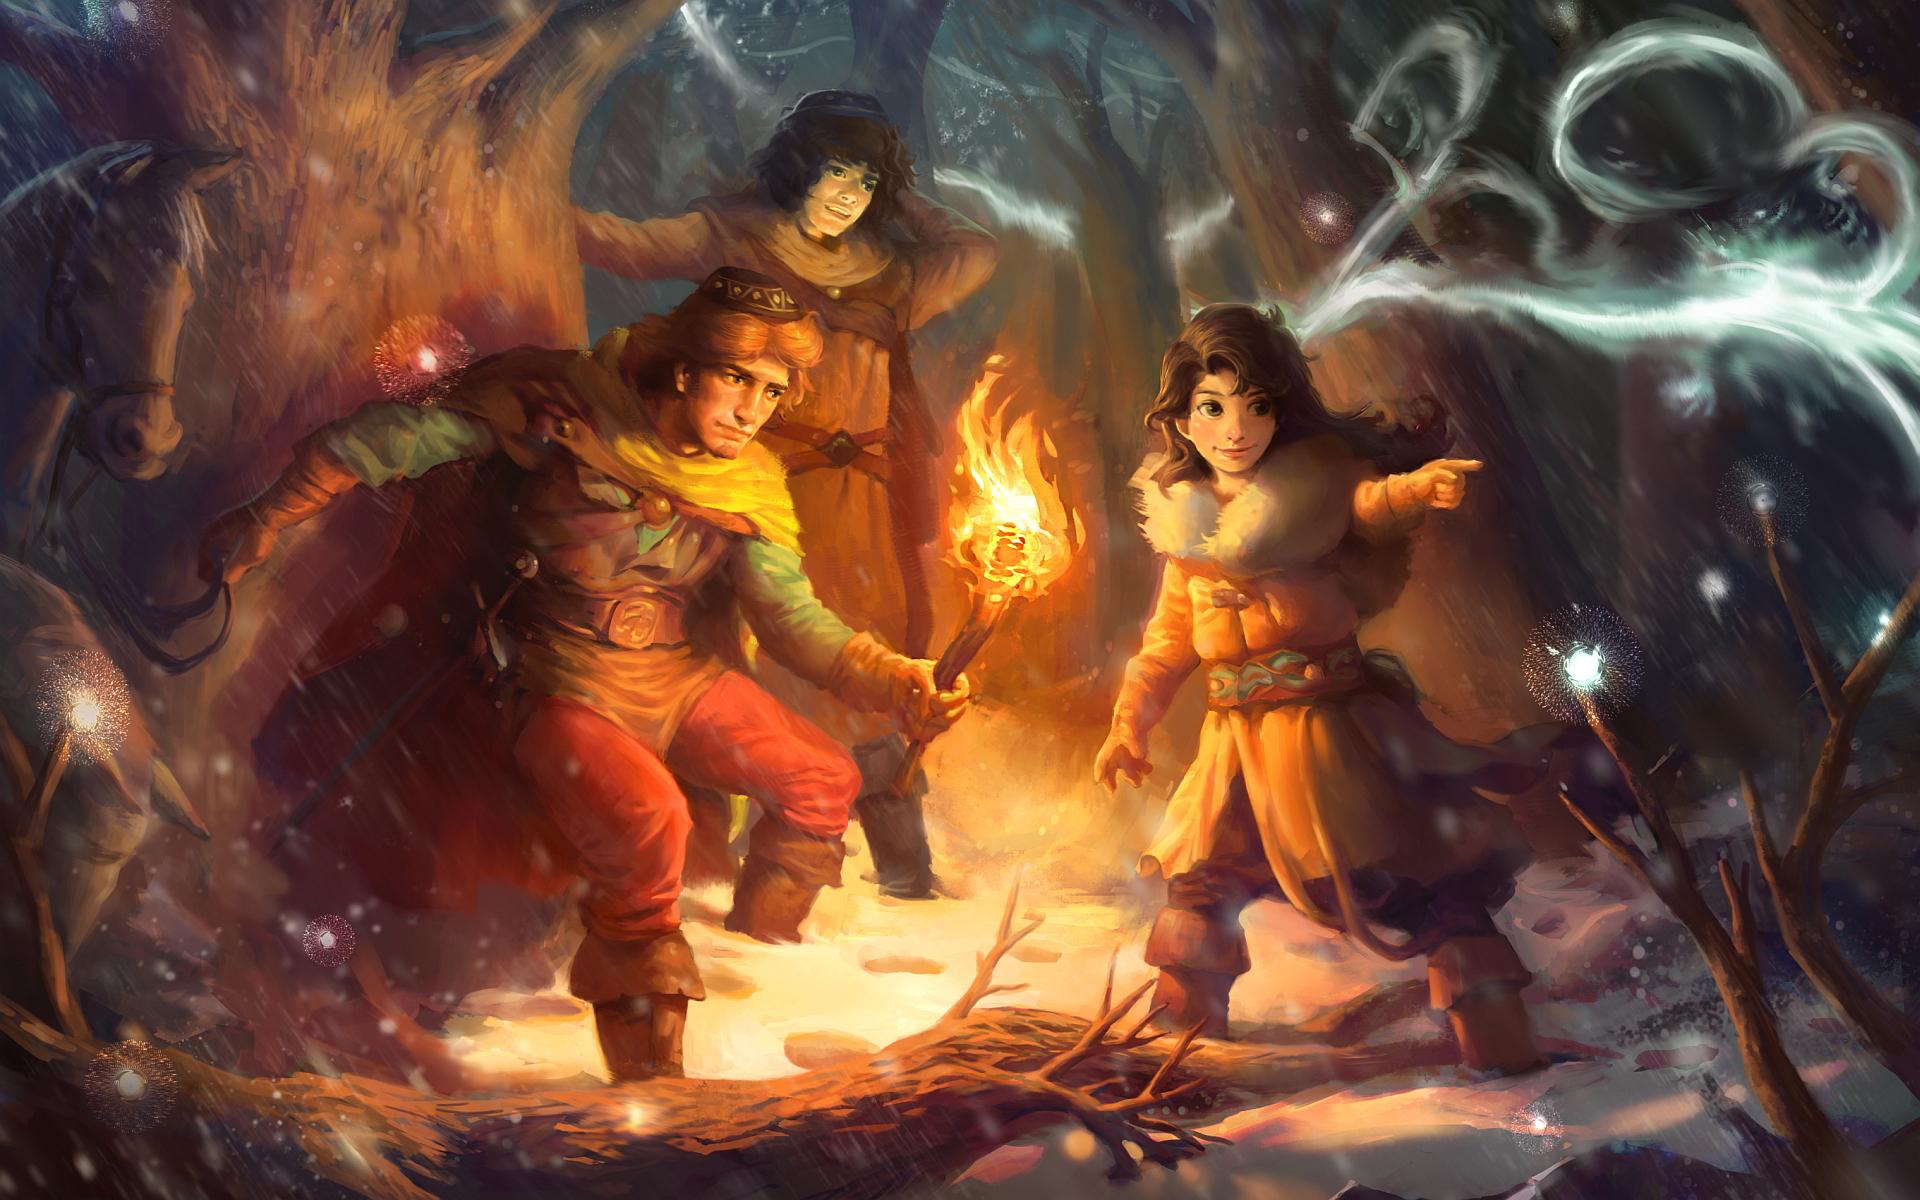 Fairytale benjamin and solomon